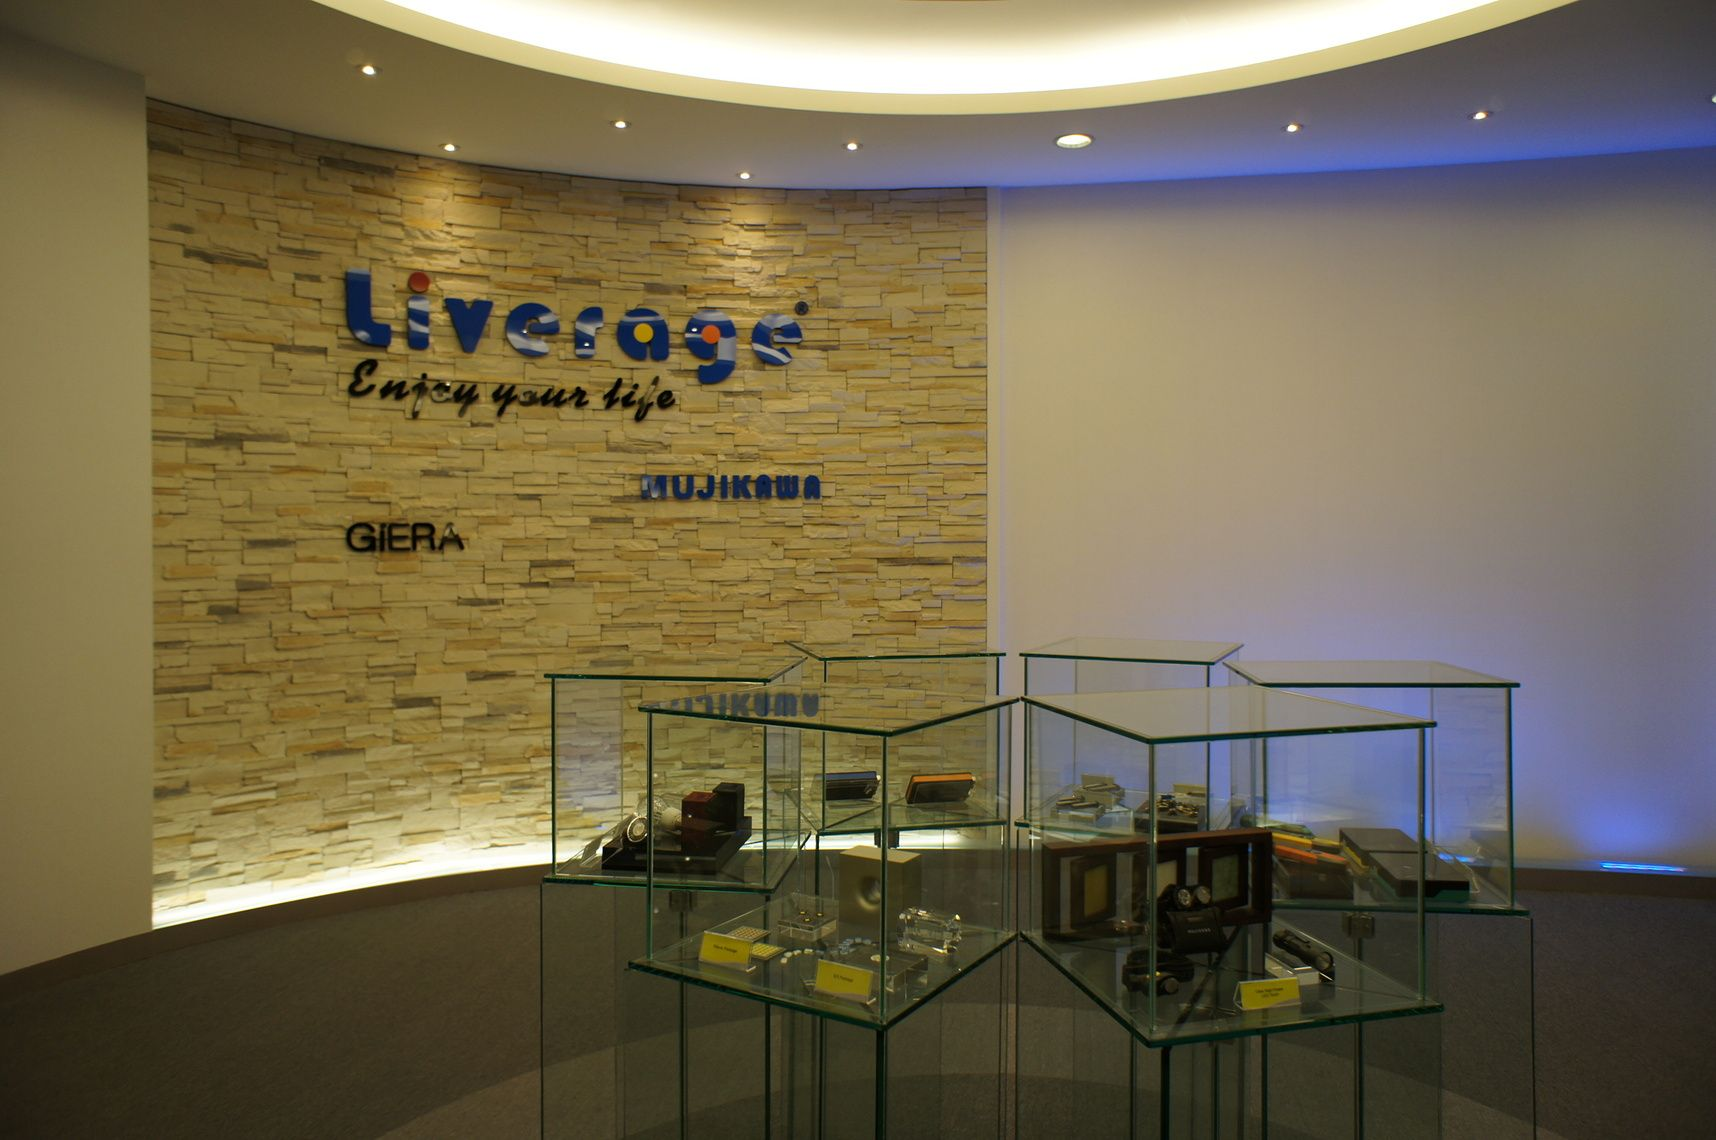 Liverage Technology Inc. 15年以上にわたって光ファイバー通信業界に専念してきました。